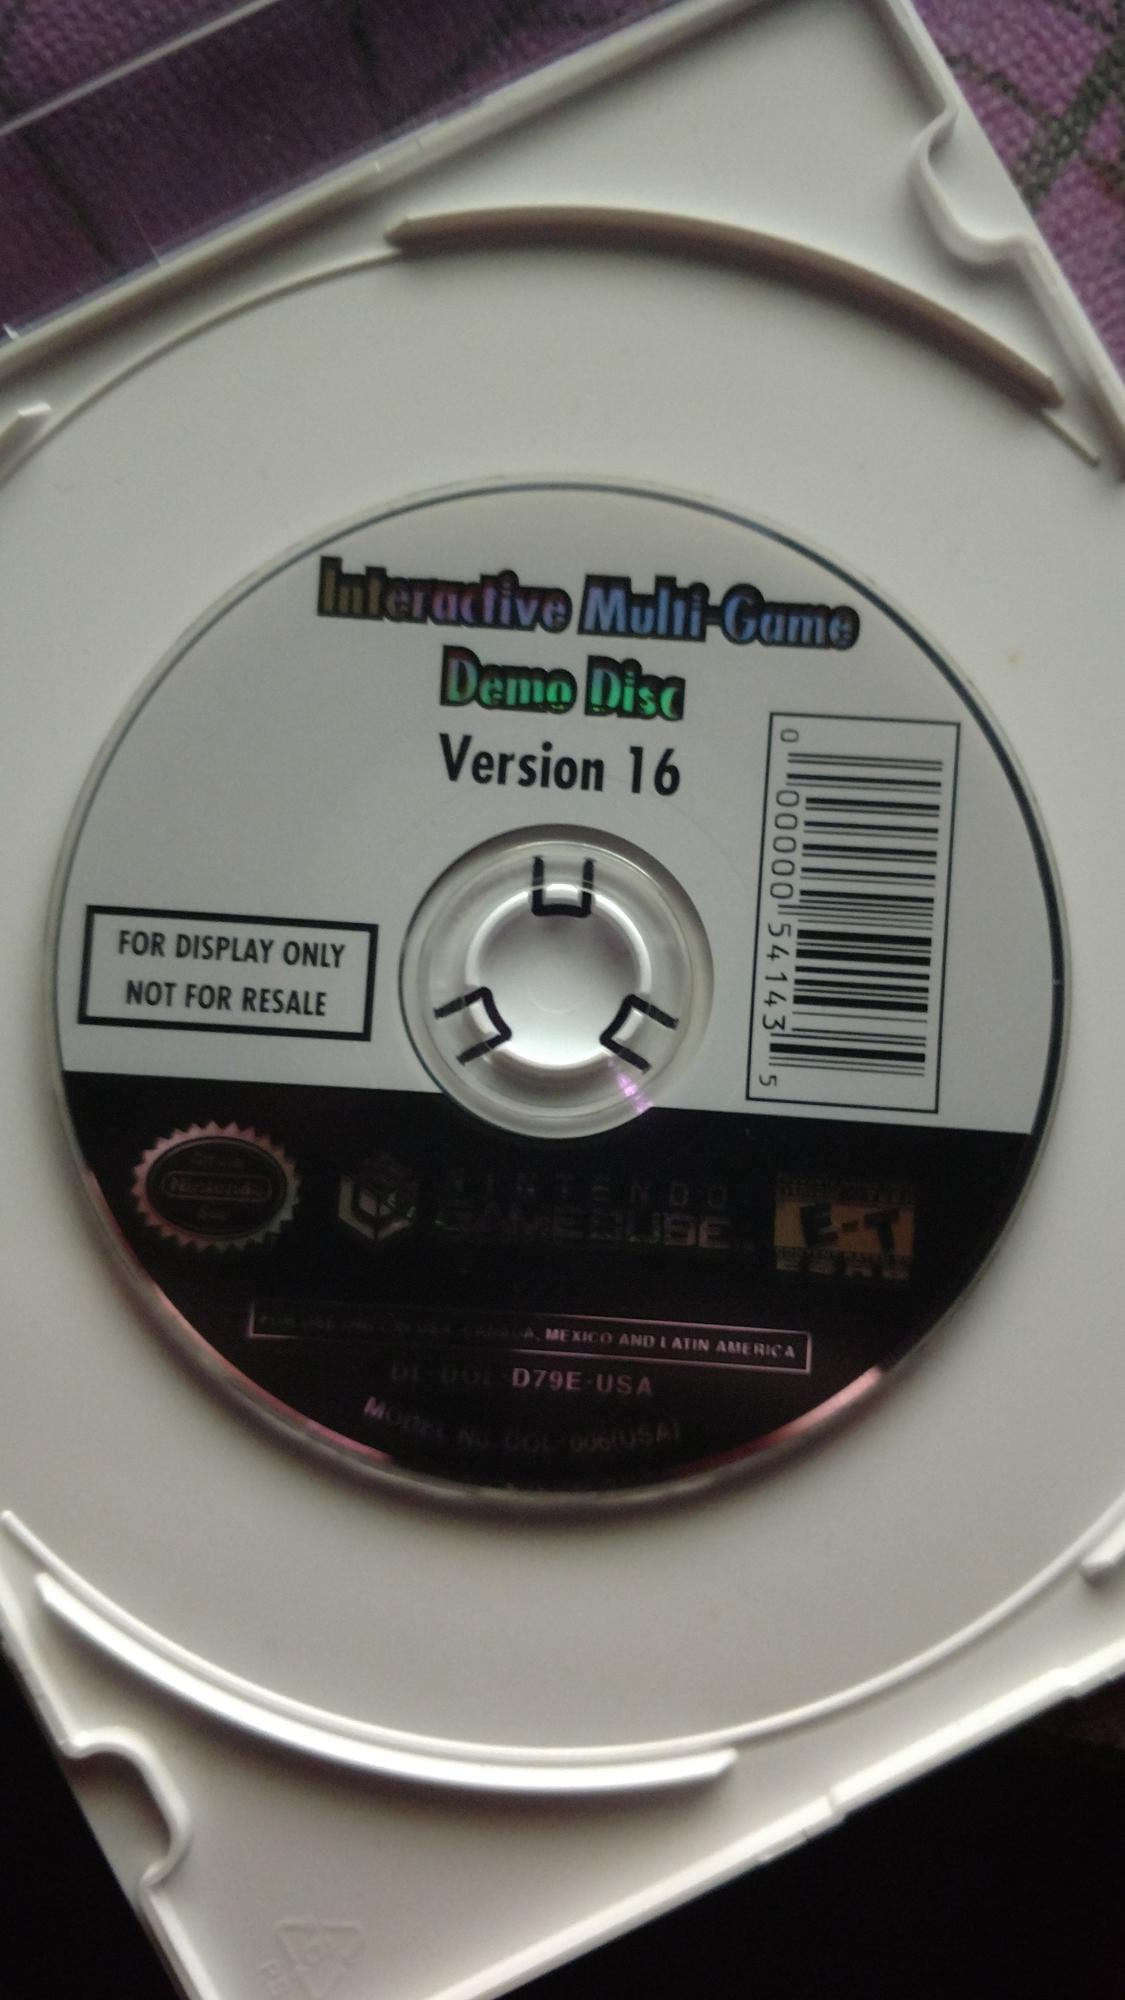 GameCube Interactive Multi-Game Demo Disc 14 [Berry Glitch